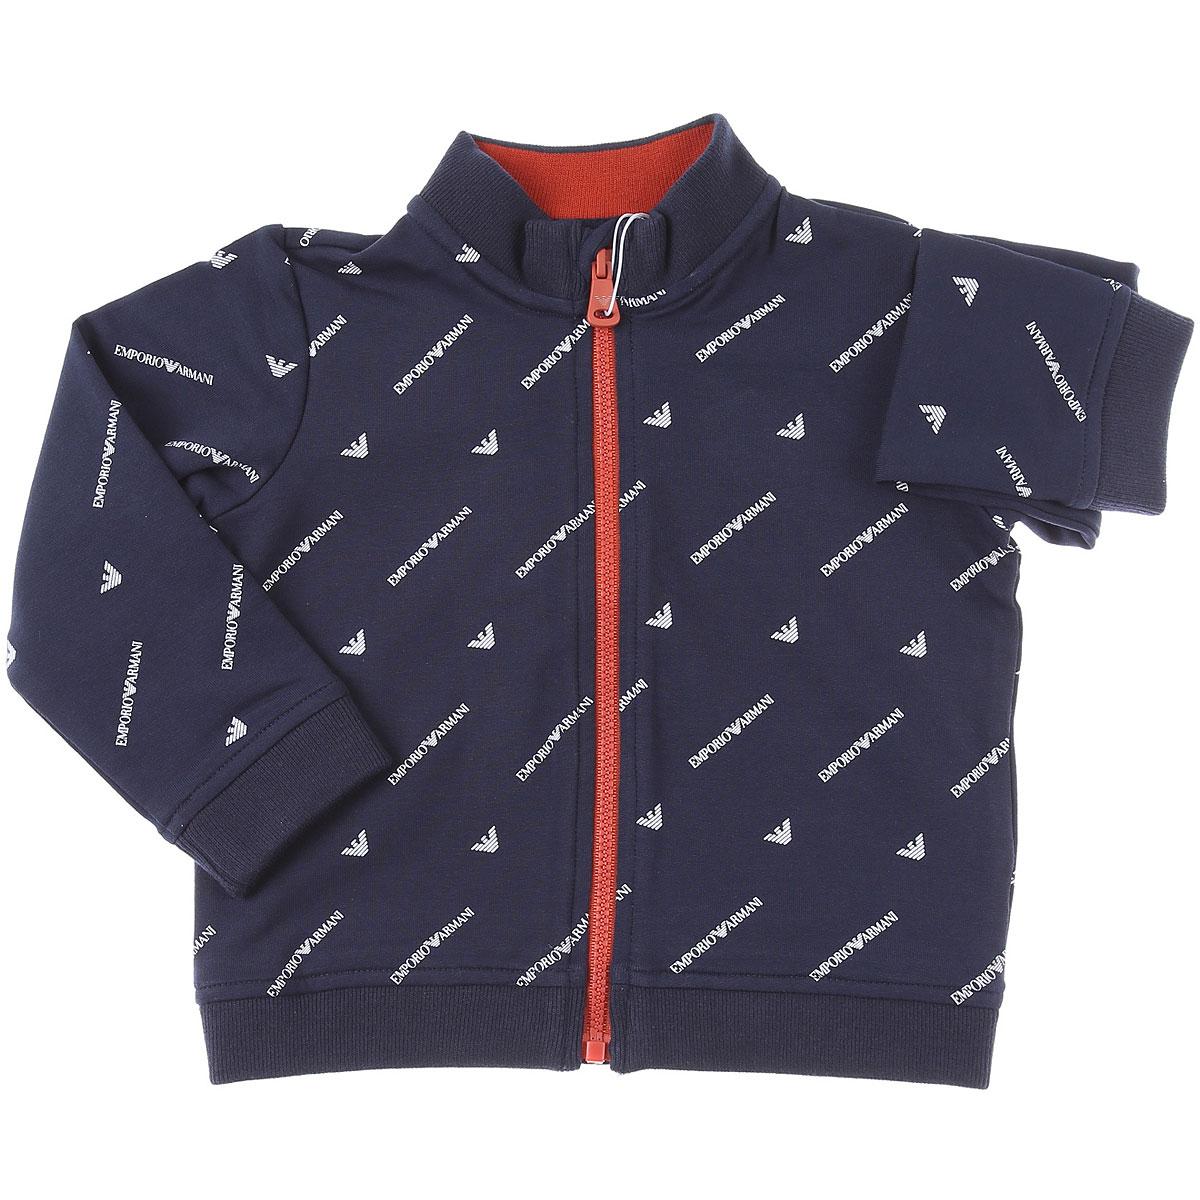 Emporio Armani Baby Sweatshirts & Hoodies for Boys On Sale, Blue, Cotton, 2019, 12 M 18M 2Y 3Y 9M